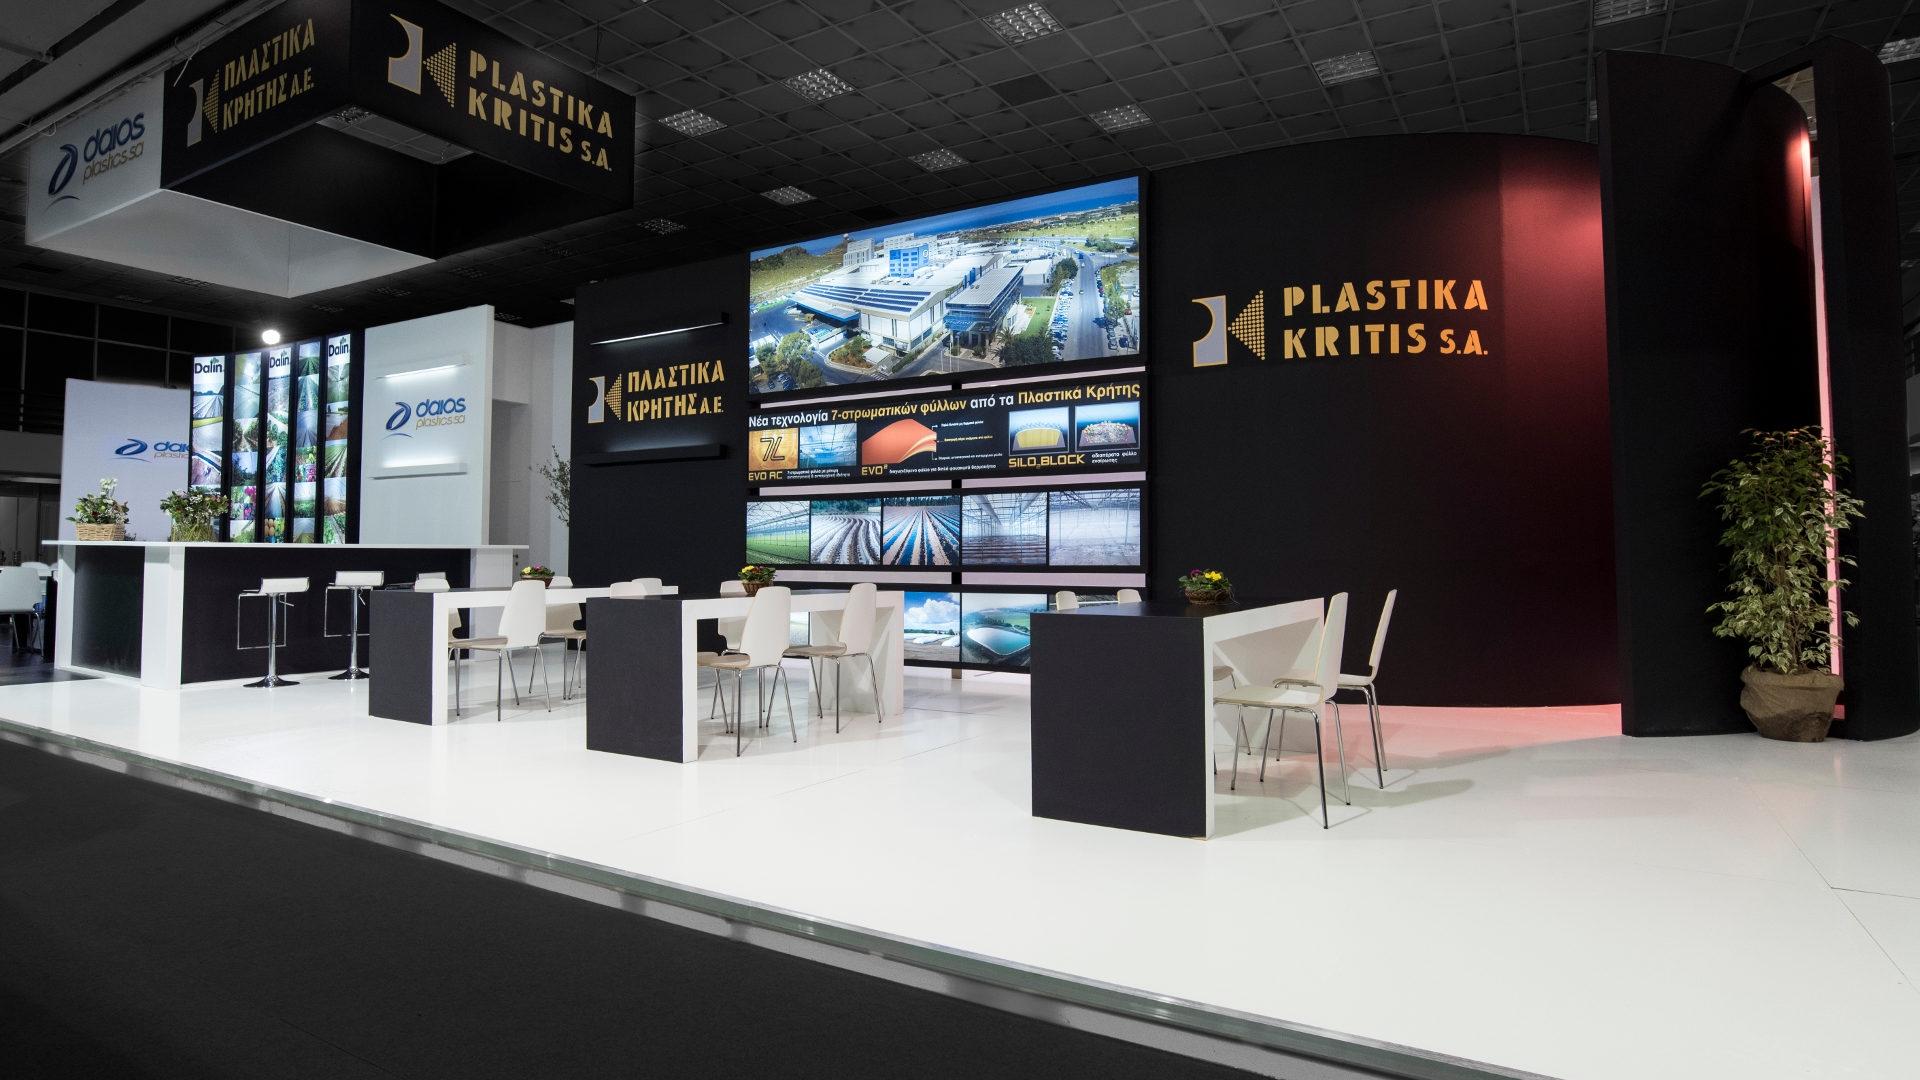 PLASTICA KRITIS - AGROTICA -THESSALONIKI